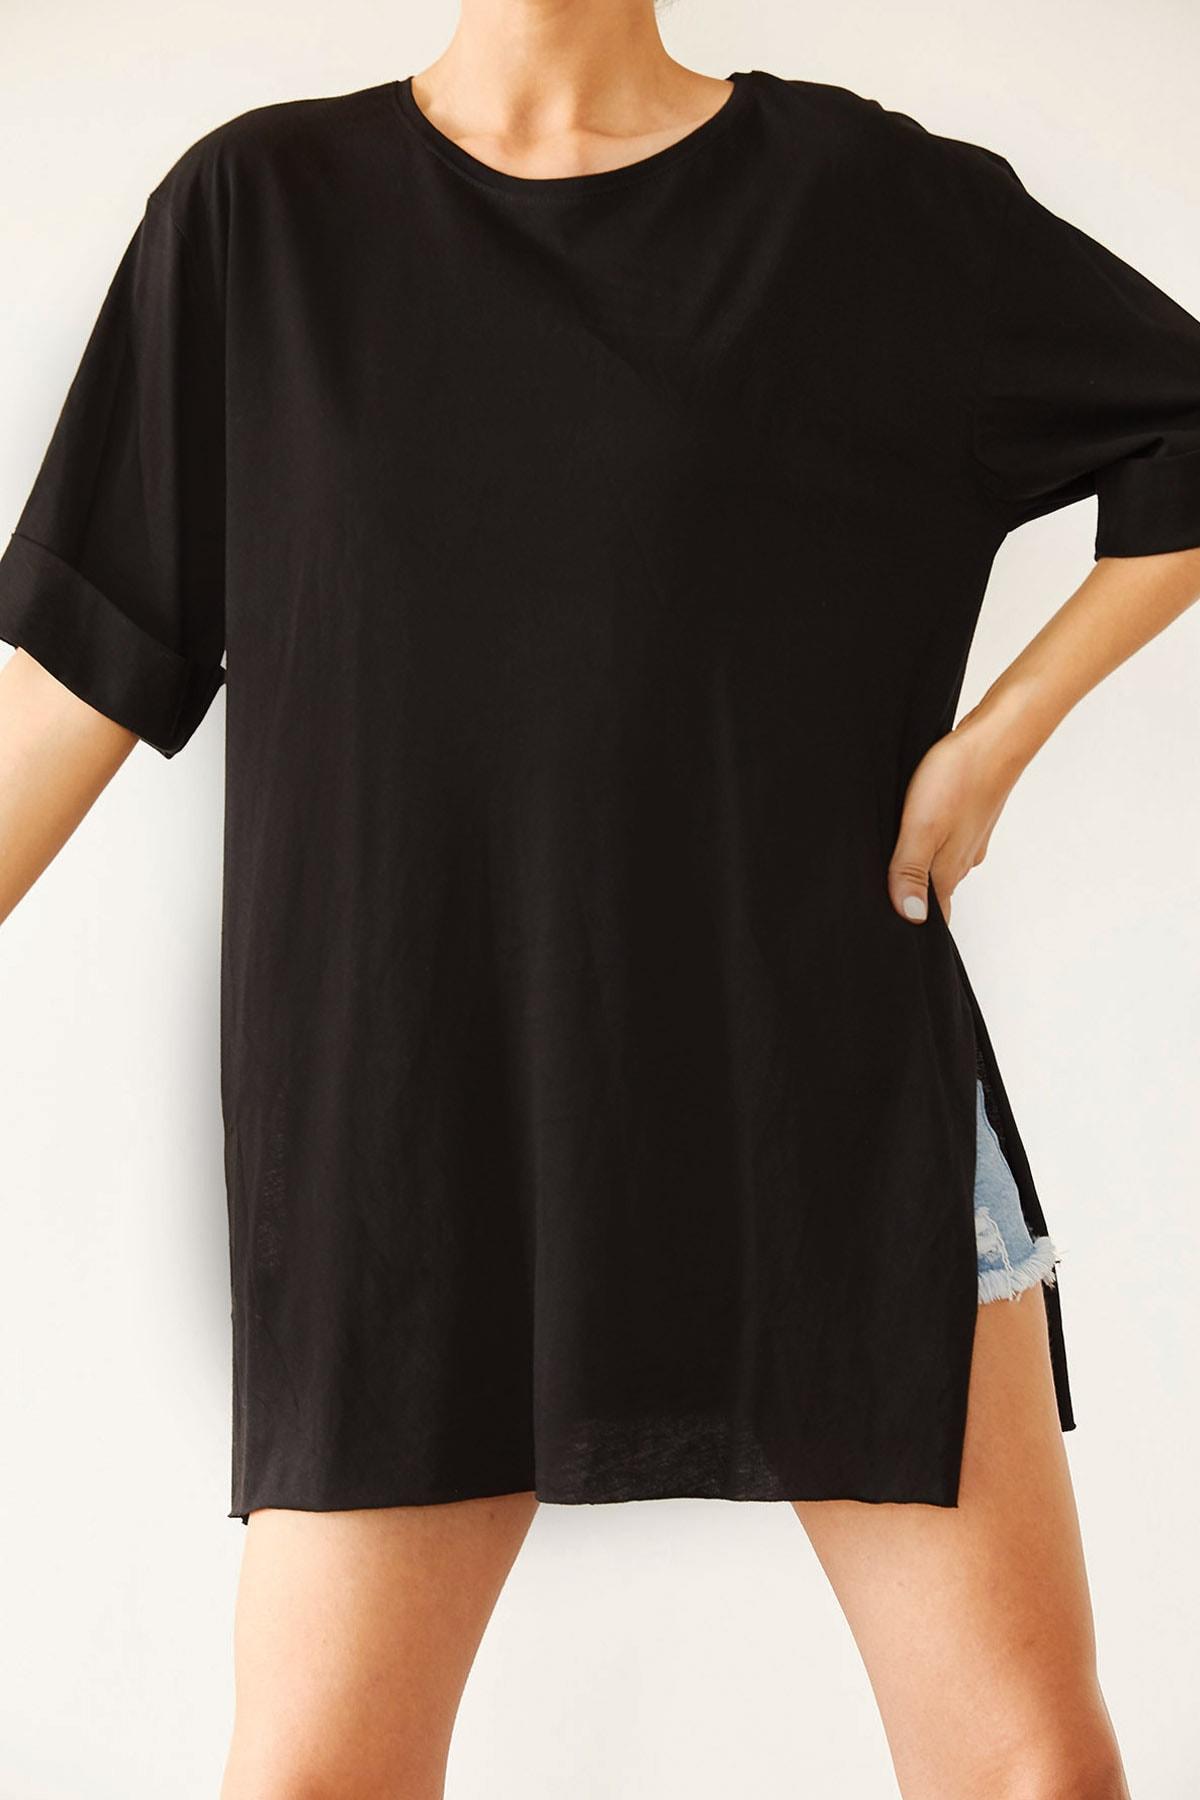 XENA Kadın Siyah Boyfriend Basic Tişört 0YZK1-10343 1